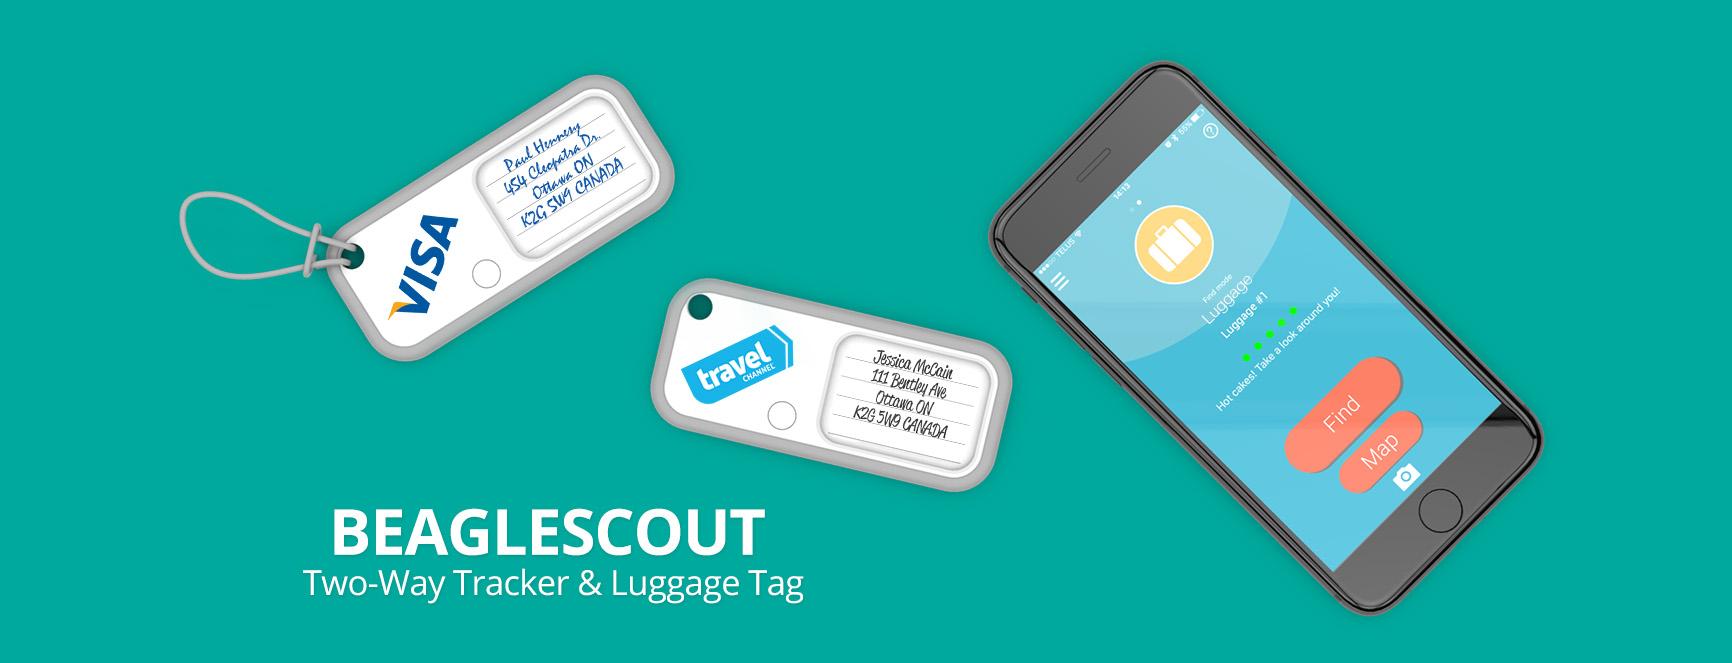 BeagleScout App